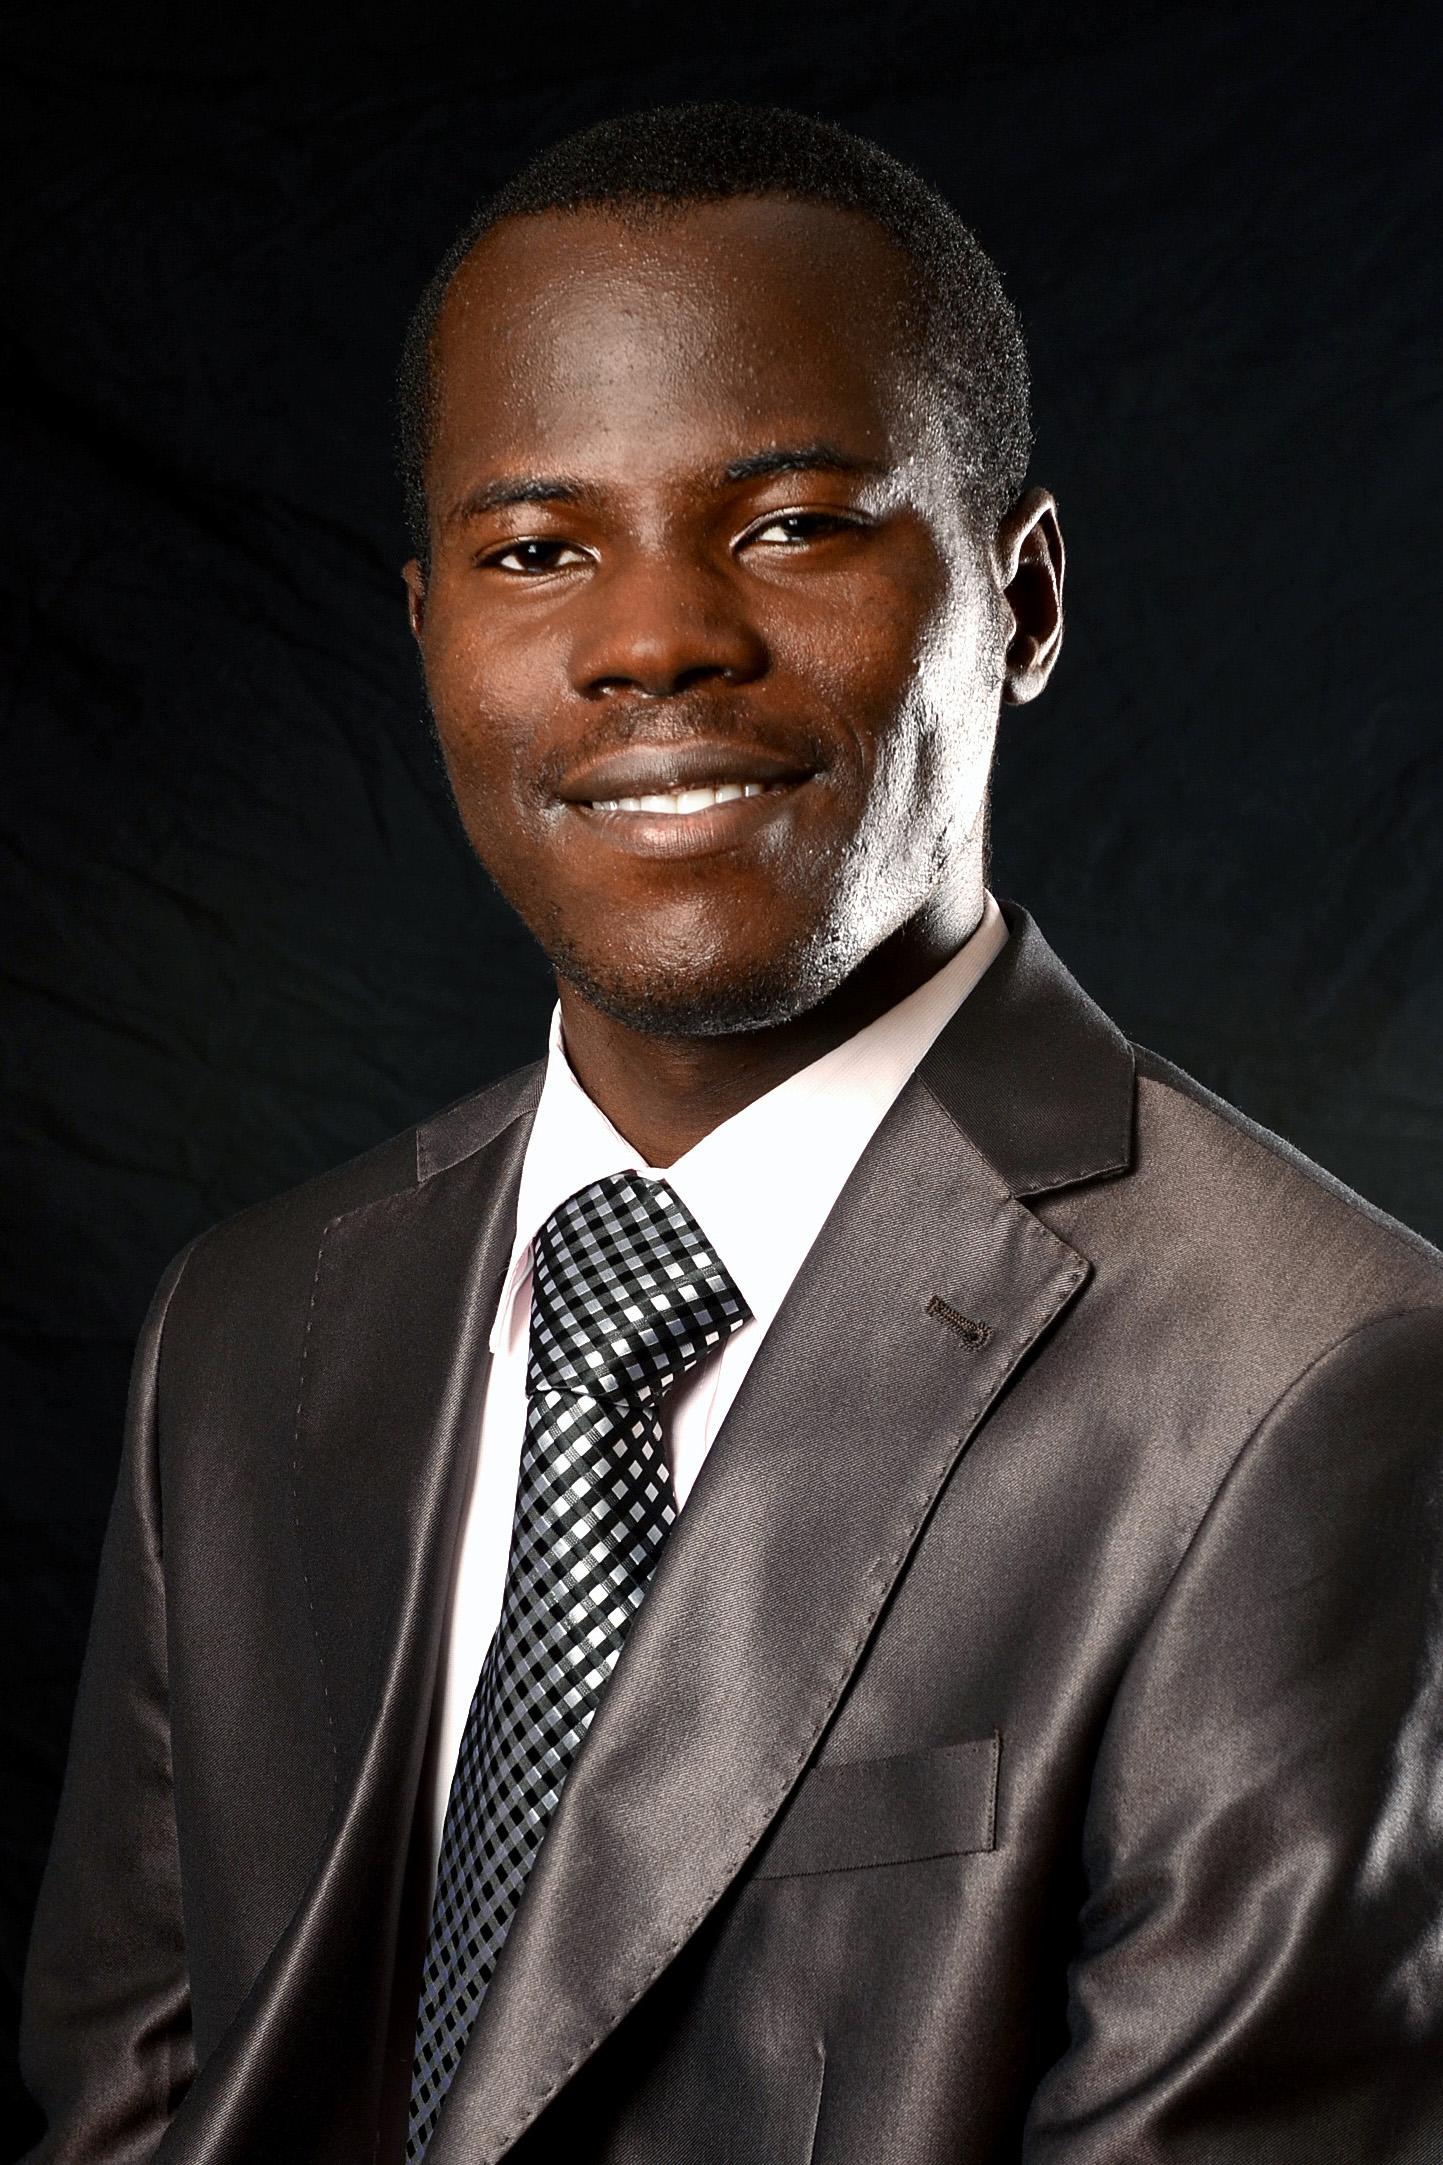 Albert Otshudi Longe. Photo courtesy of Board of Global Ministries.